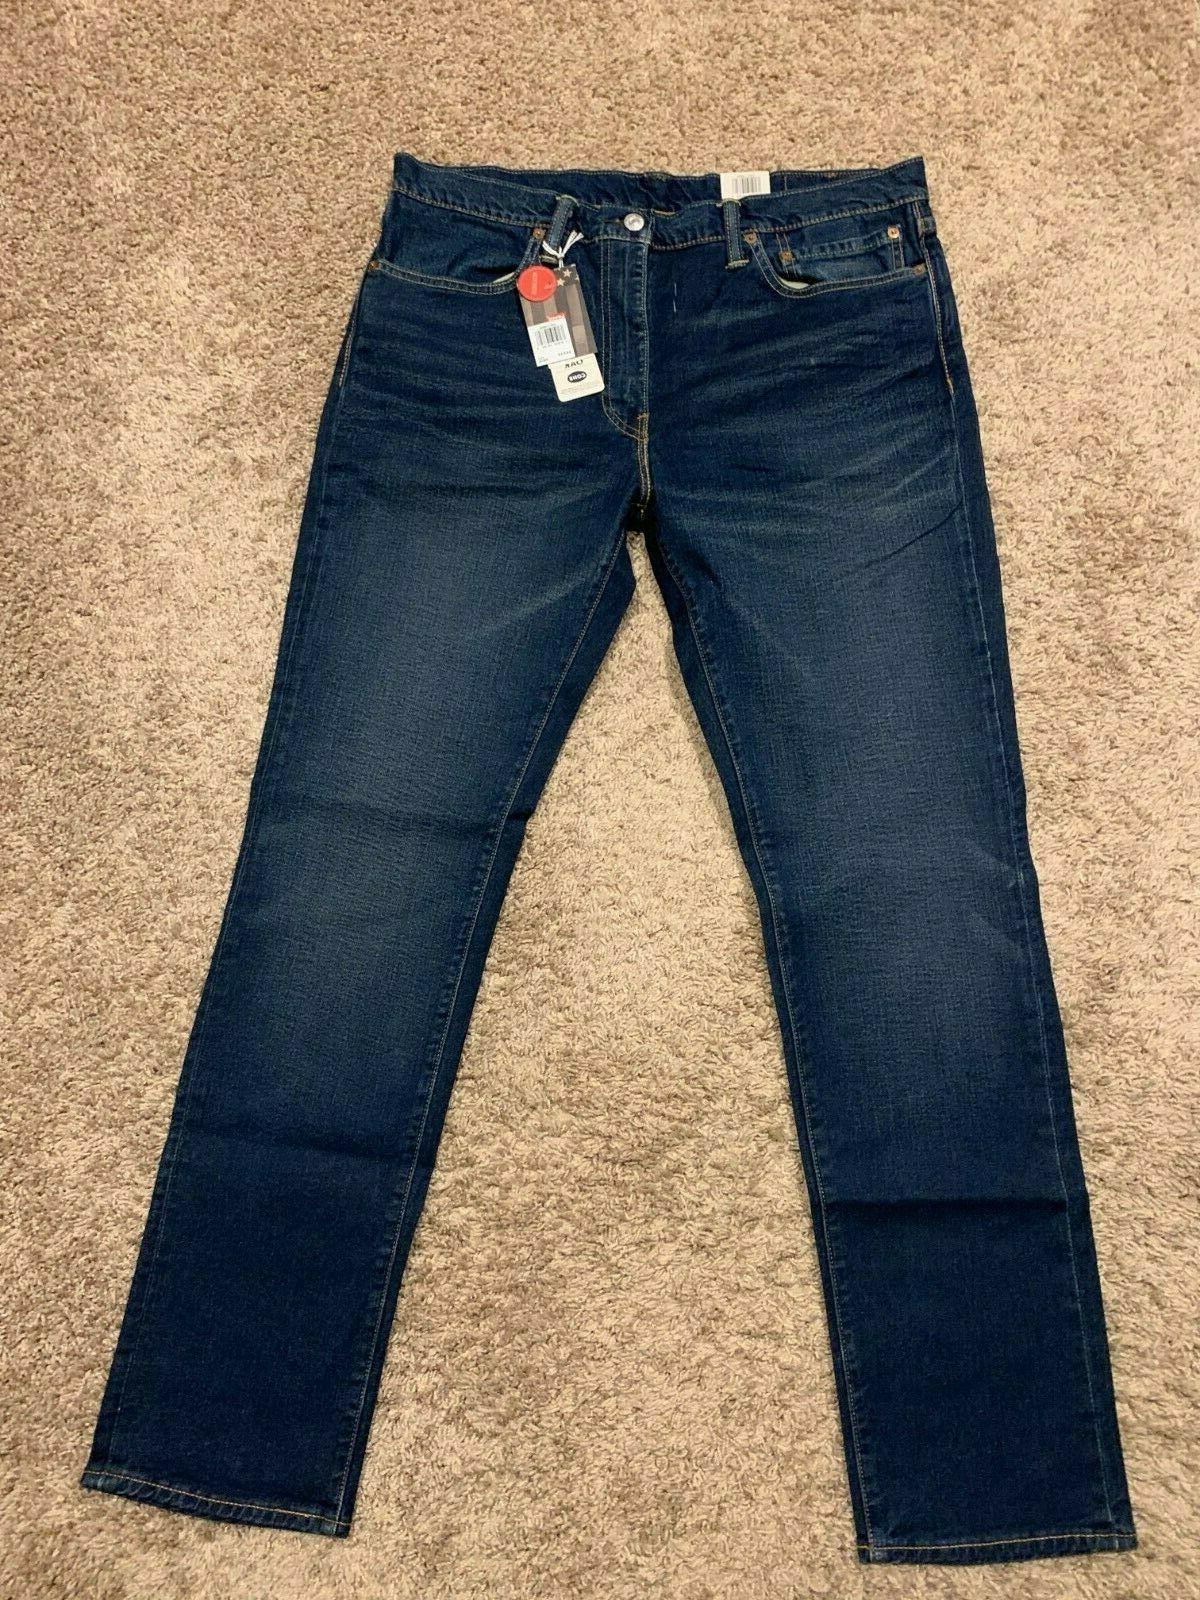 Levi's 511 White Oak Jeans RT$98